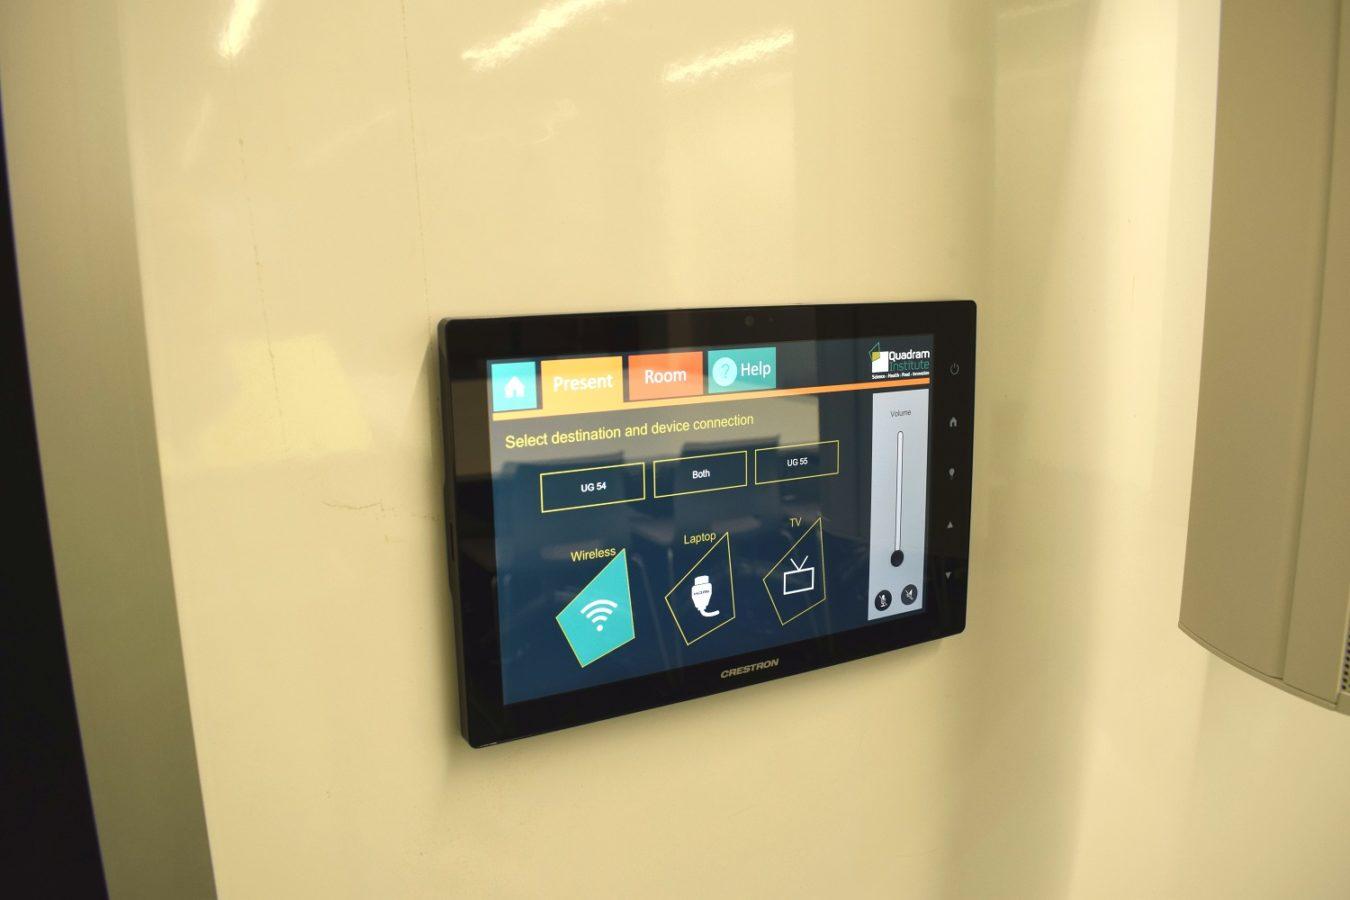 Crestron 10.1 Control Panel